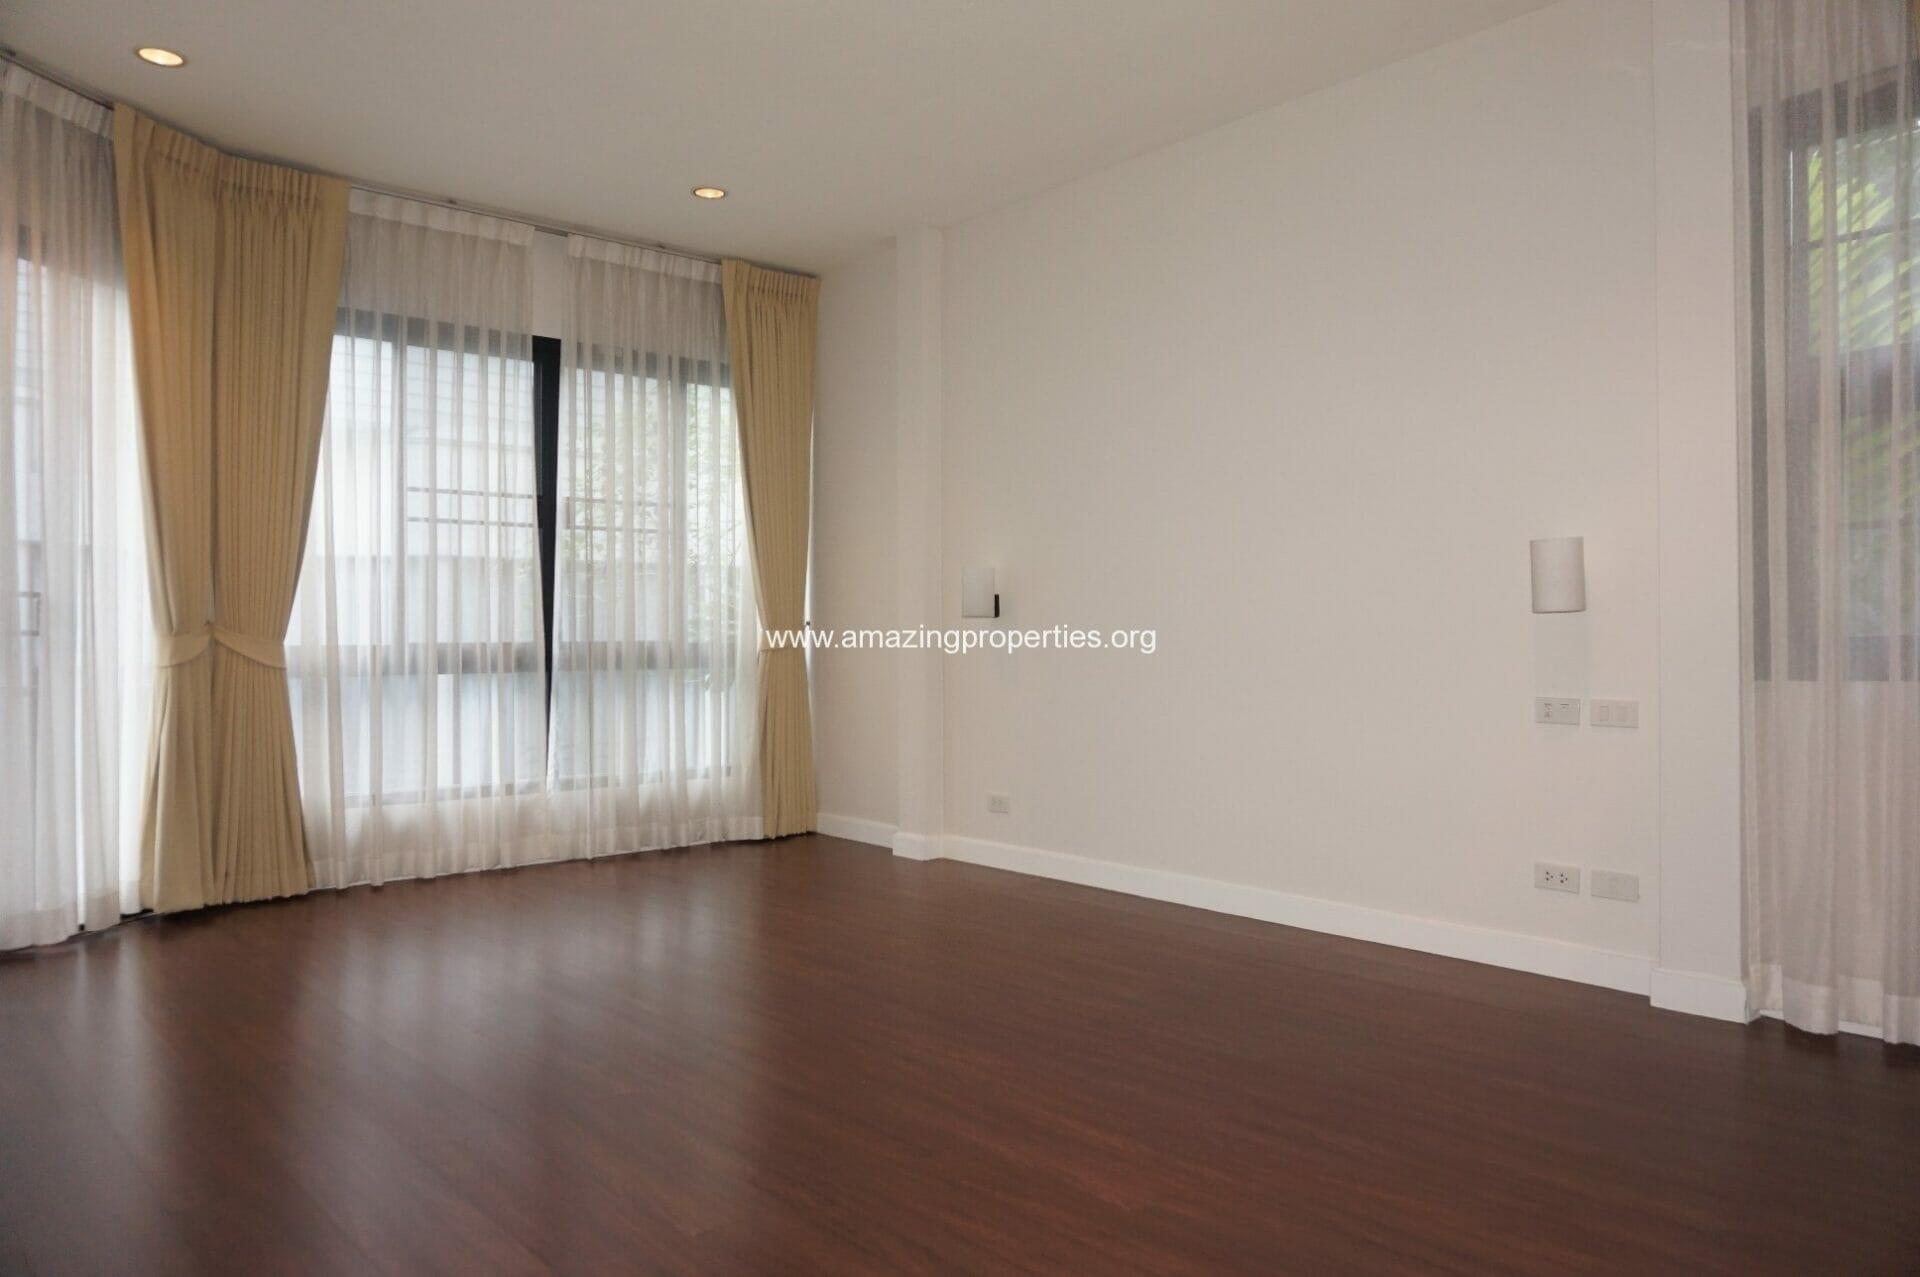 4 bedroom Veranda Ville-9